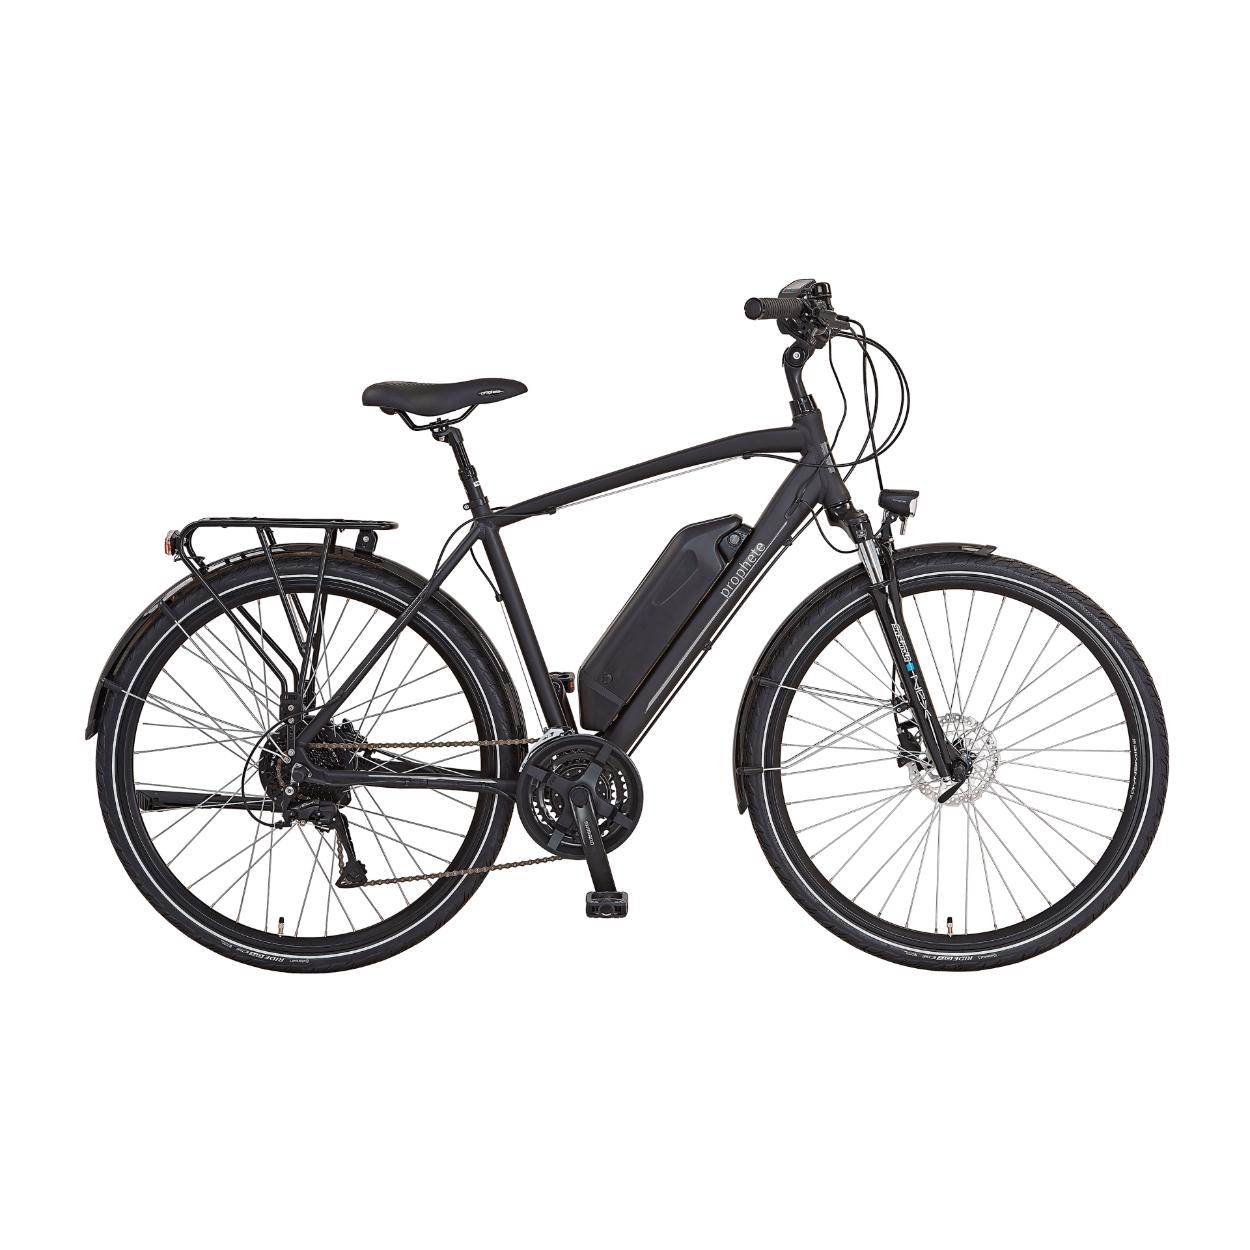 elektrische fiets, e-bike, aldi, folder, betaalbar